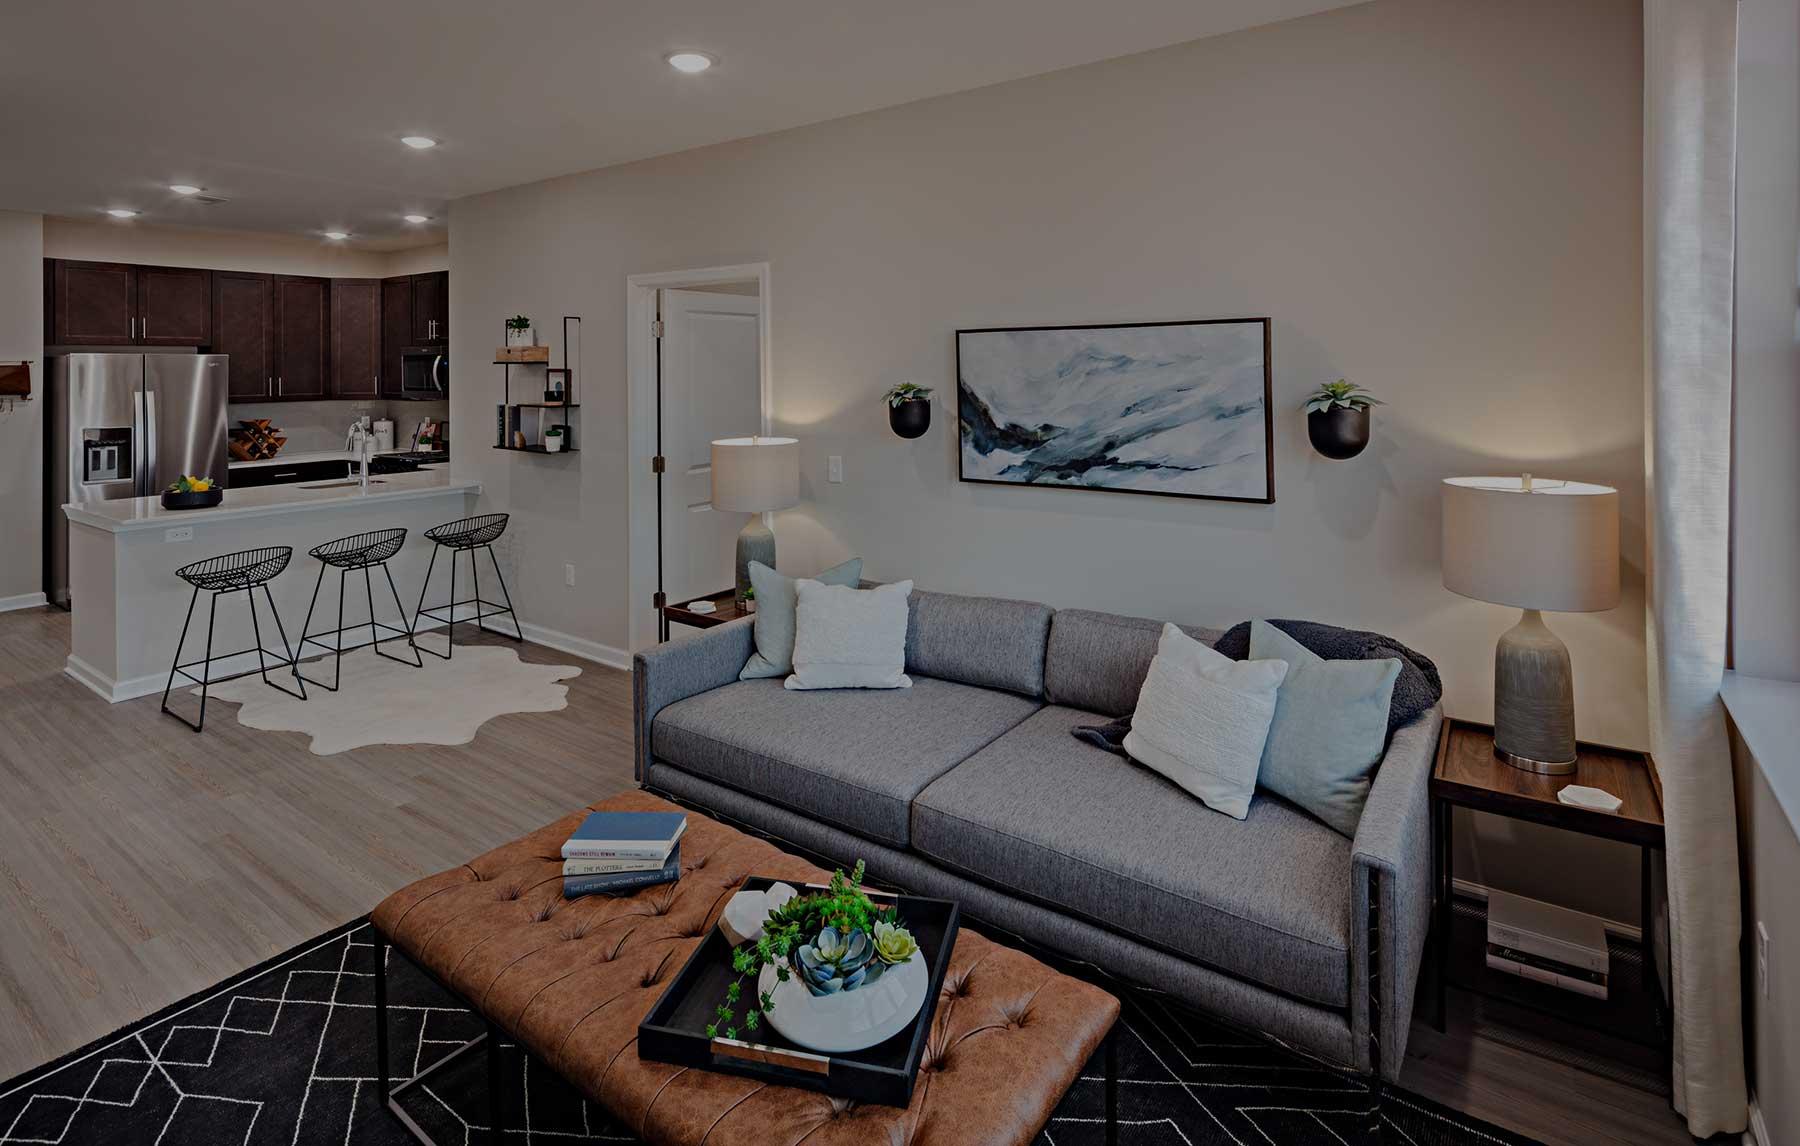 The Lofts at Monroe Parke Living Room interior